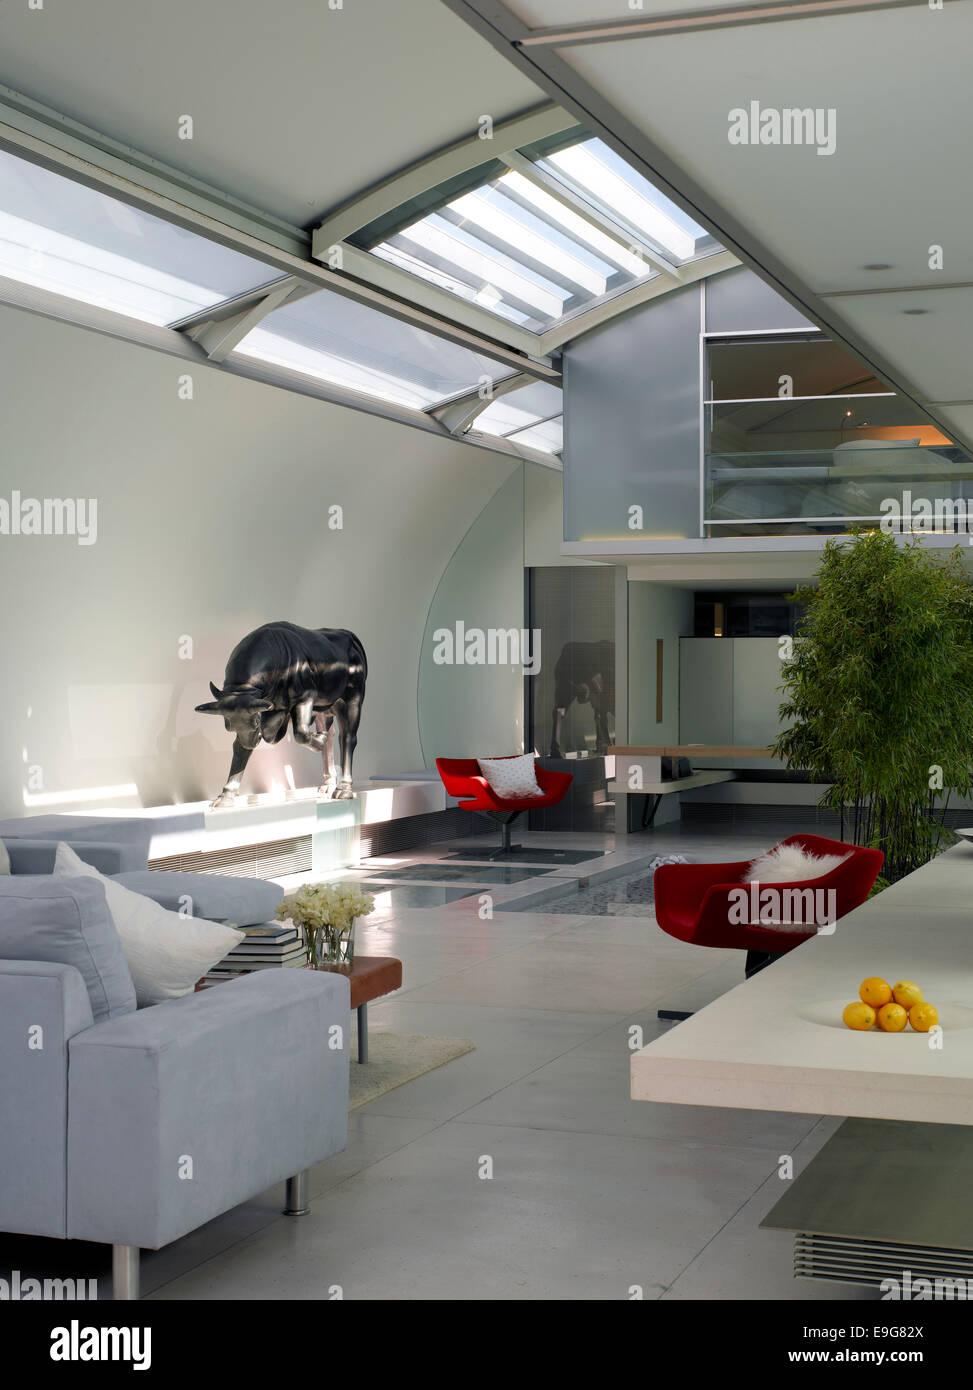 Modern Eco Homes Stockfotos & Modern Eco Homes Bilder - Alamy